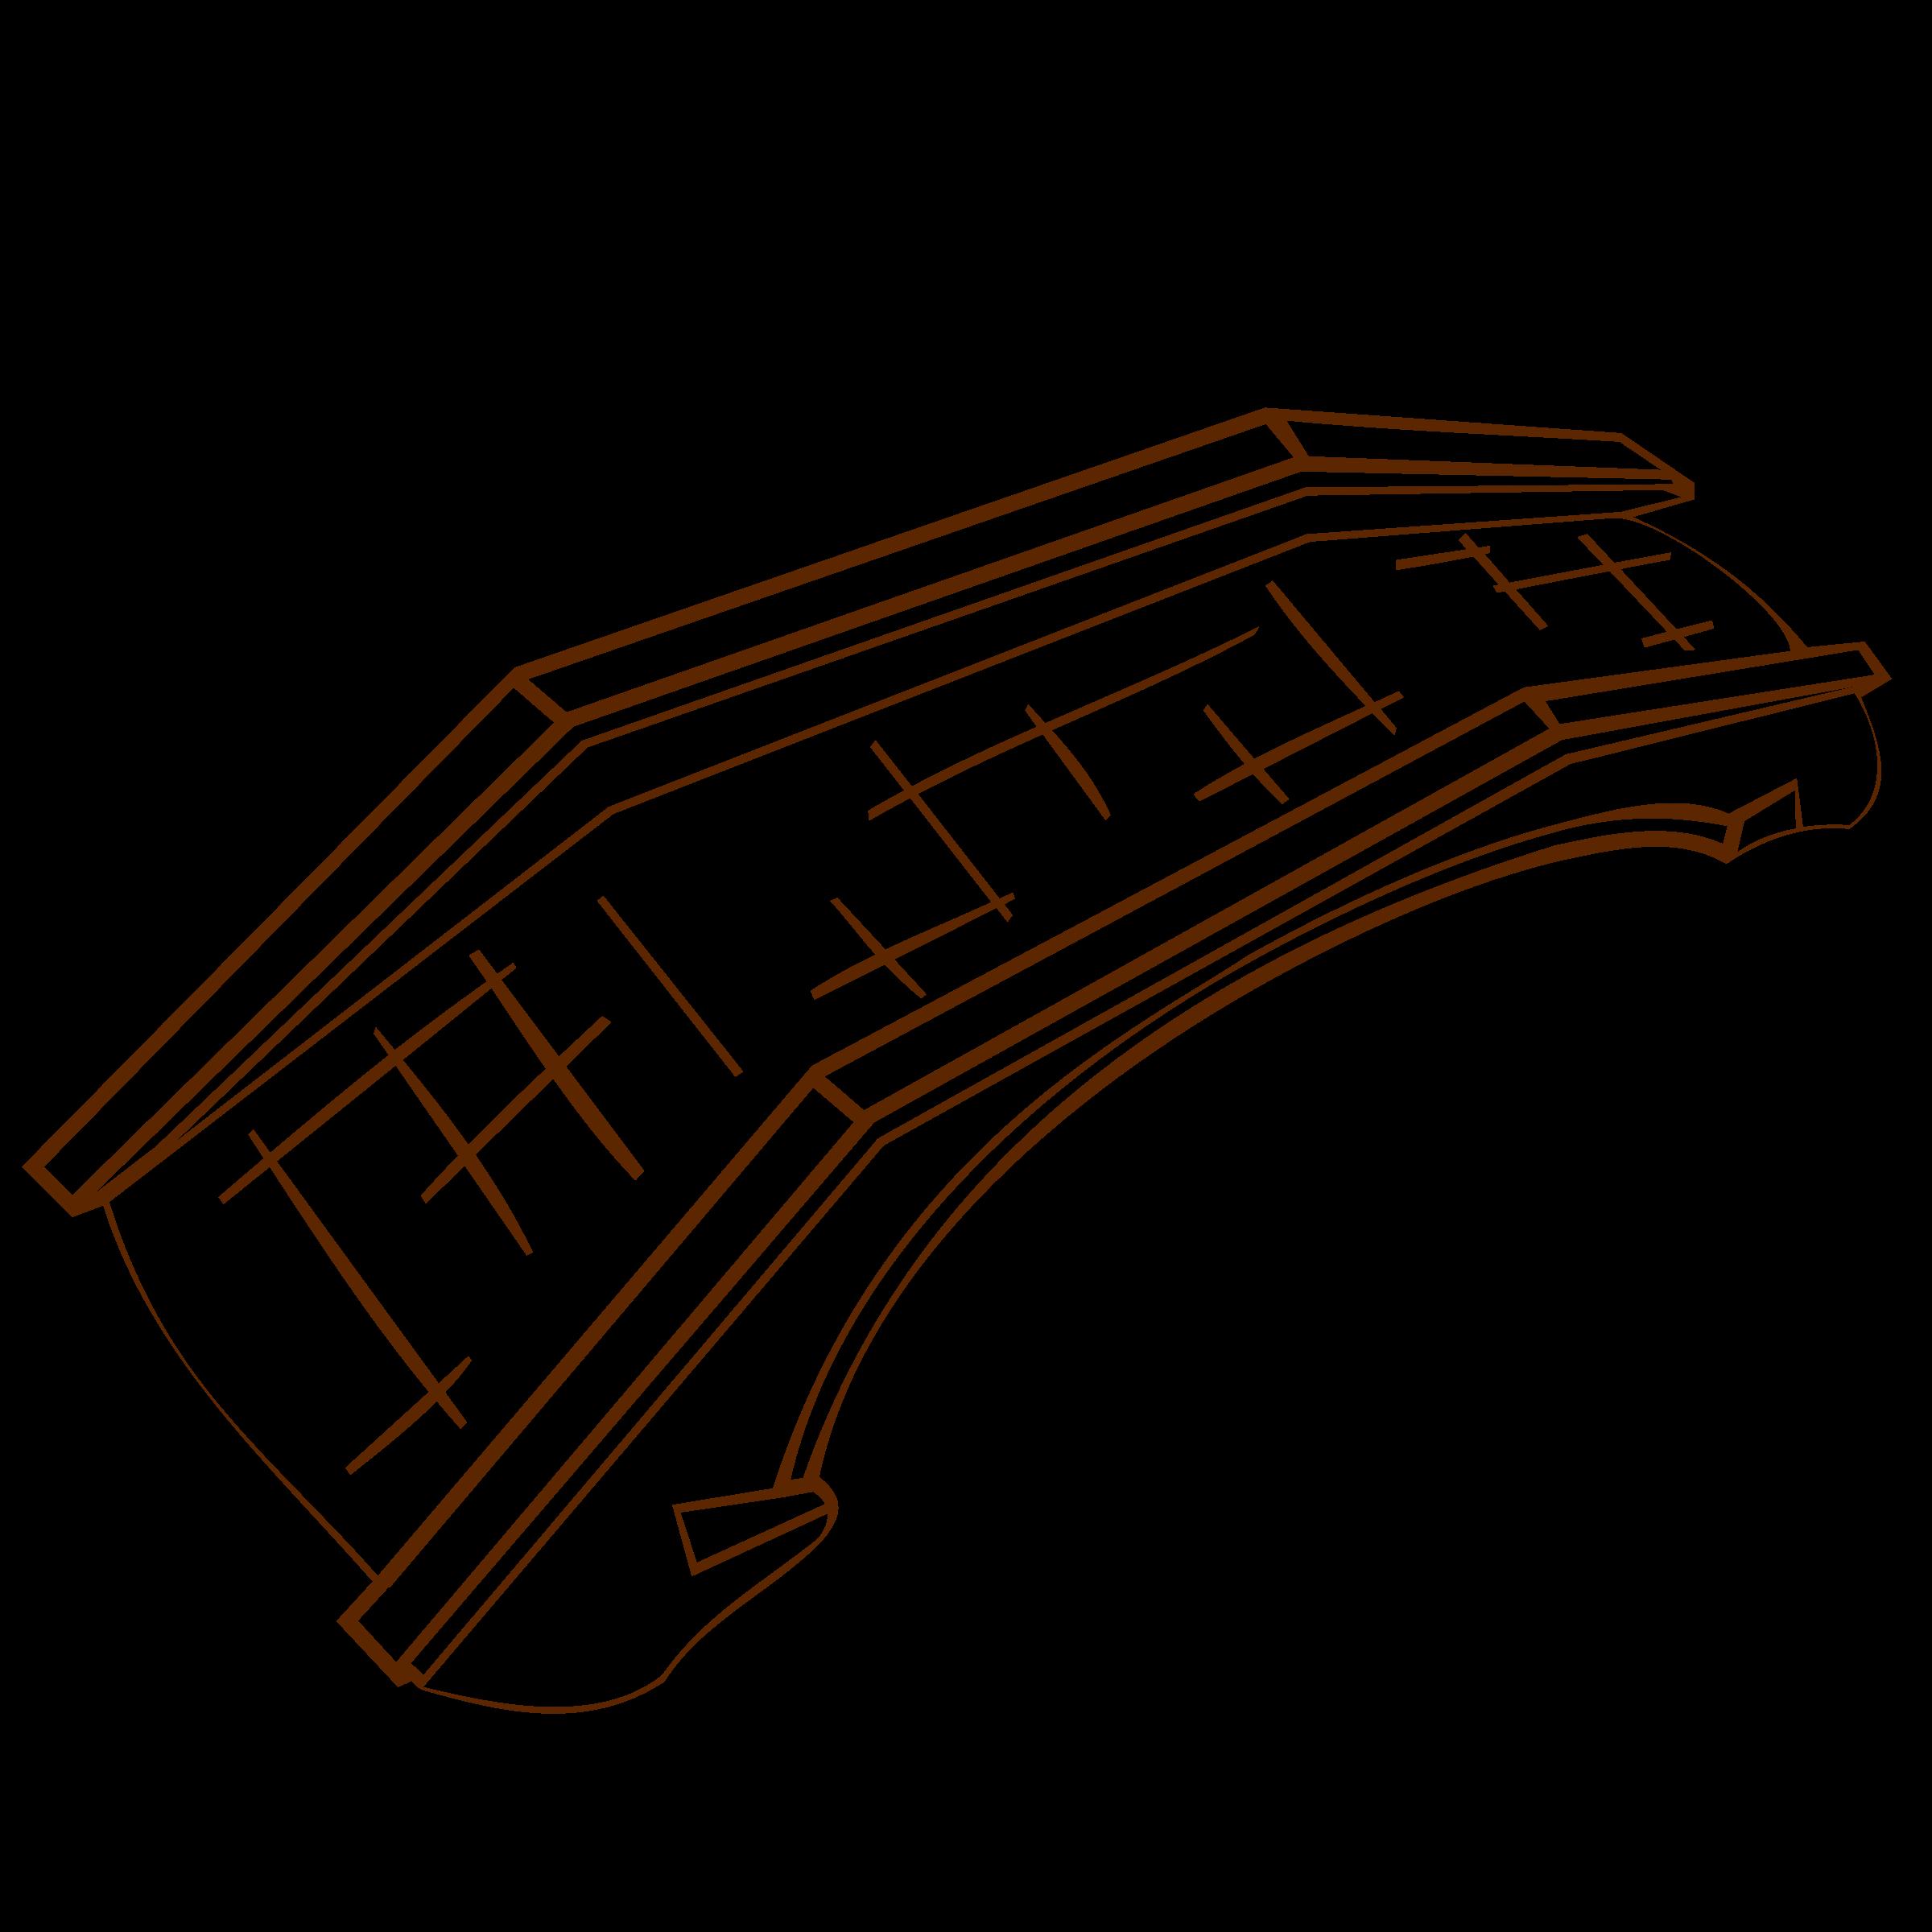 Bridge clipart outline. Rpg map symbols stone